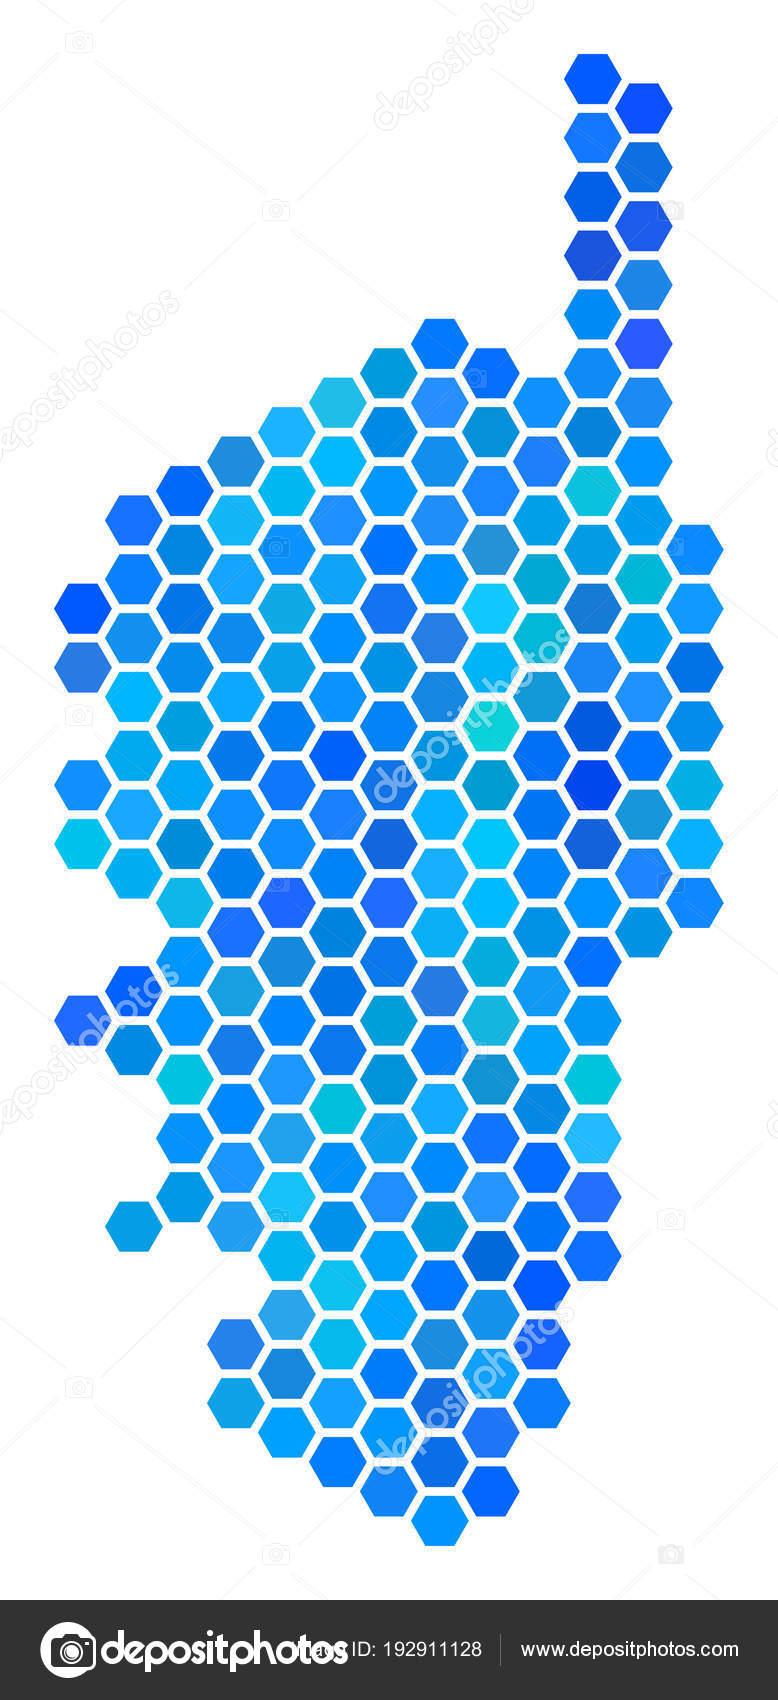 Carte Corse Fond Blanc.Carte Bleu Hexagone France Corse Image Vectorielle Ahasoft